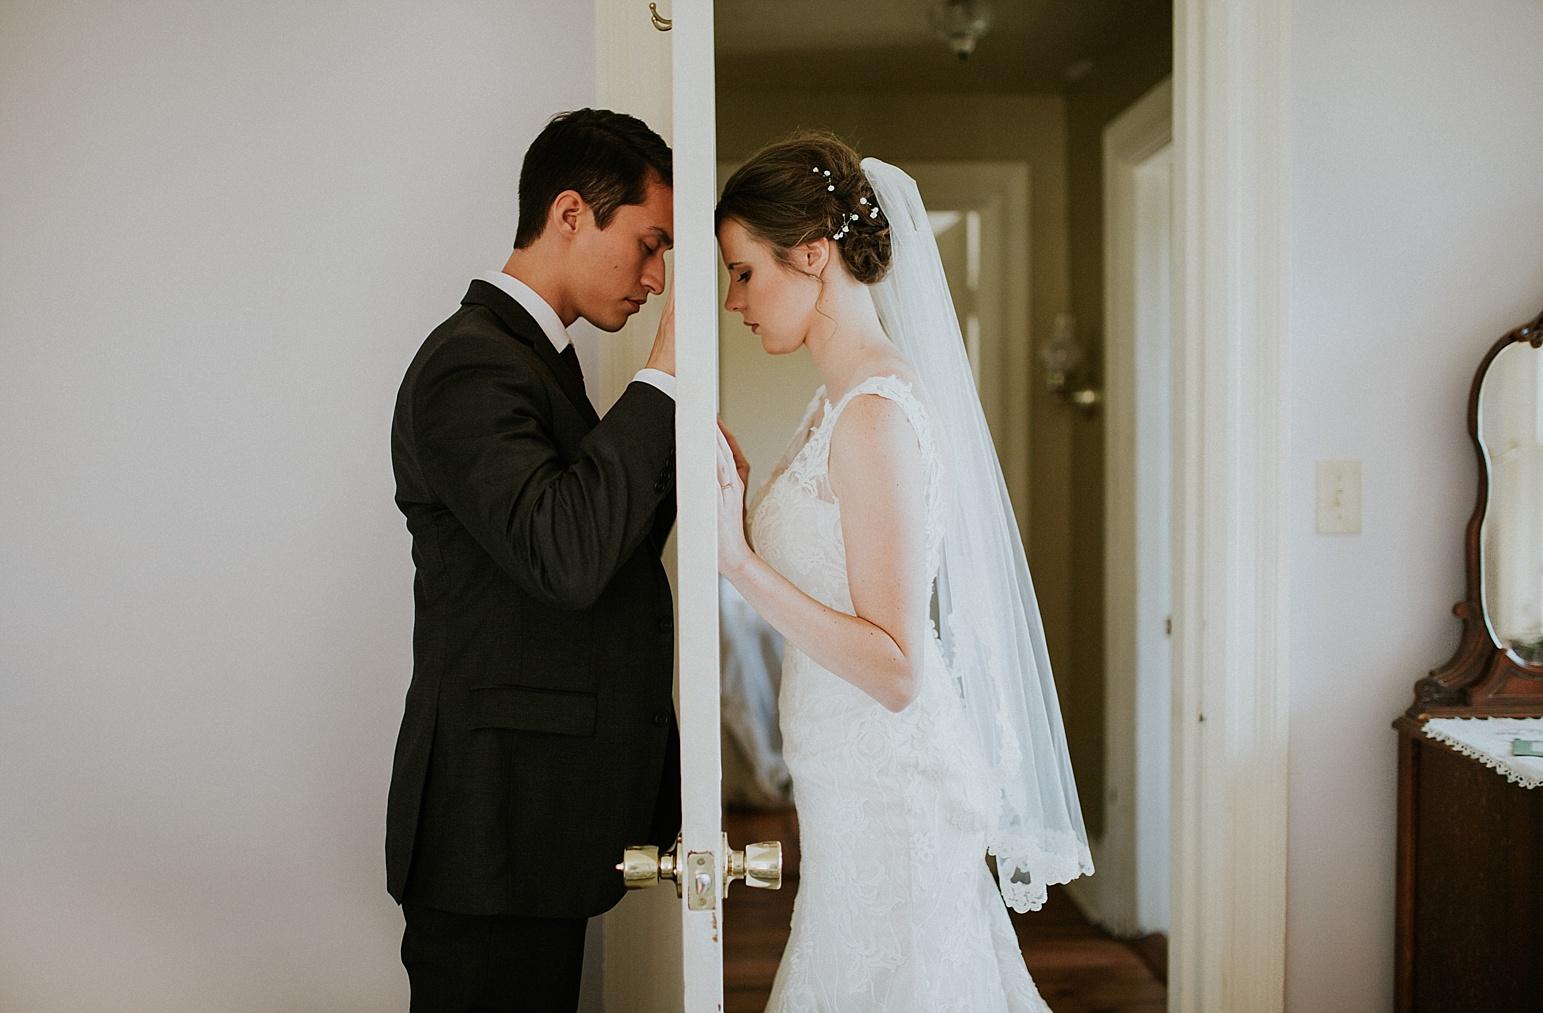 ashley_sara_photography_pittsburgh-wedding-photographer_ohio-wedding-photographer_destination-wedding-photographer4 copy.jpg